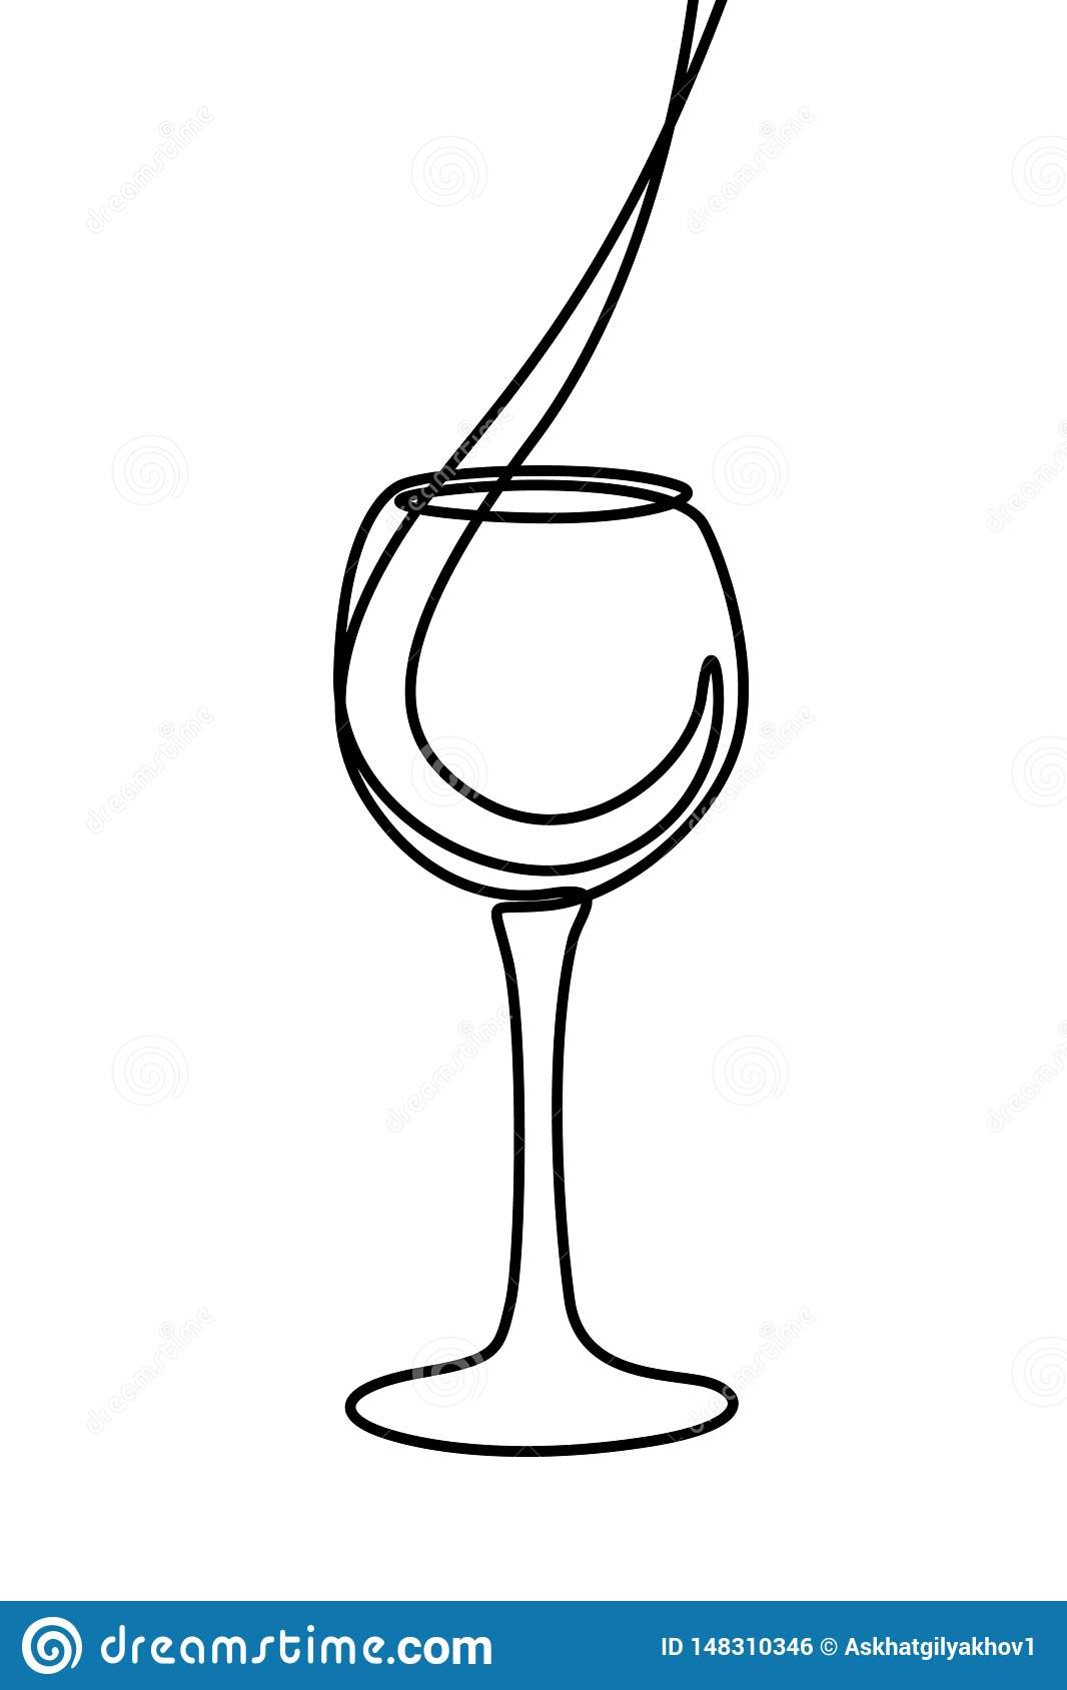 En linje flytande hälls in i ett exponeringsglas Fortl?pande linje vinglas vektor